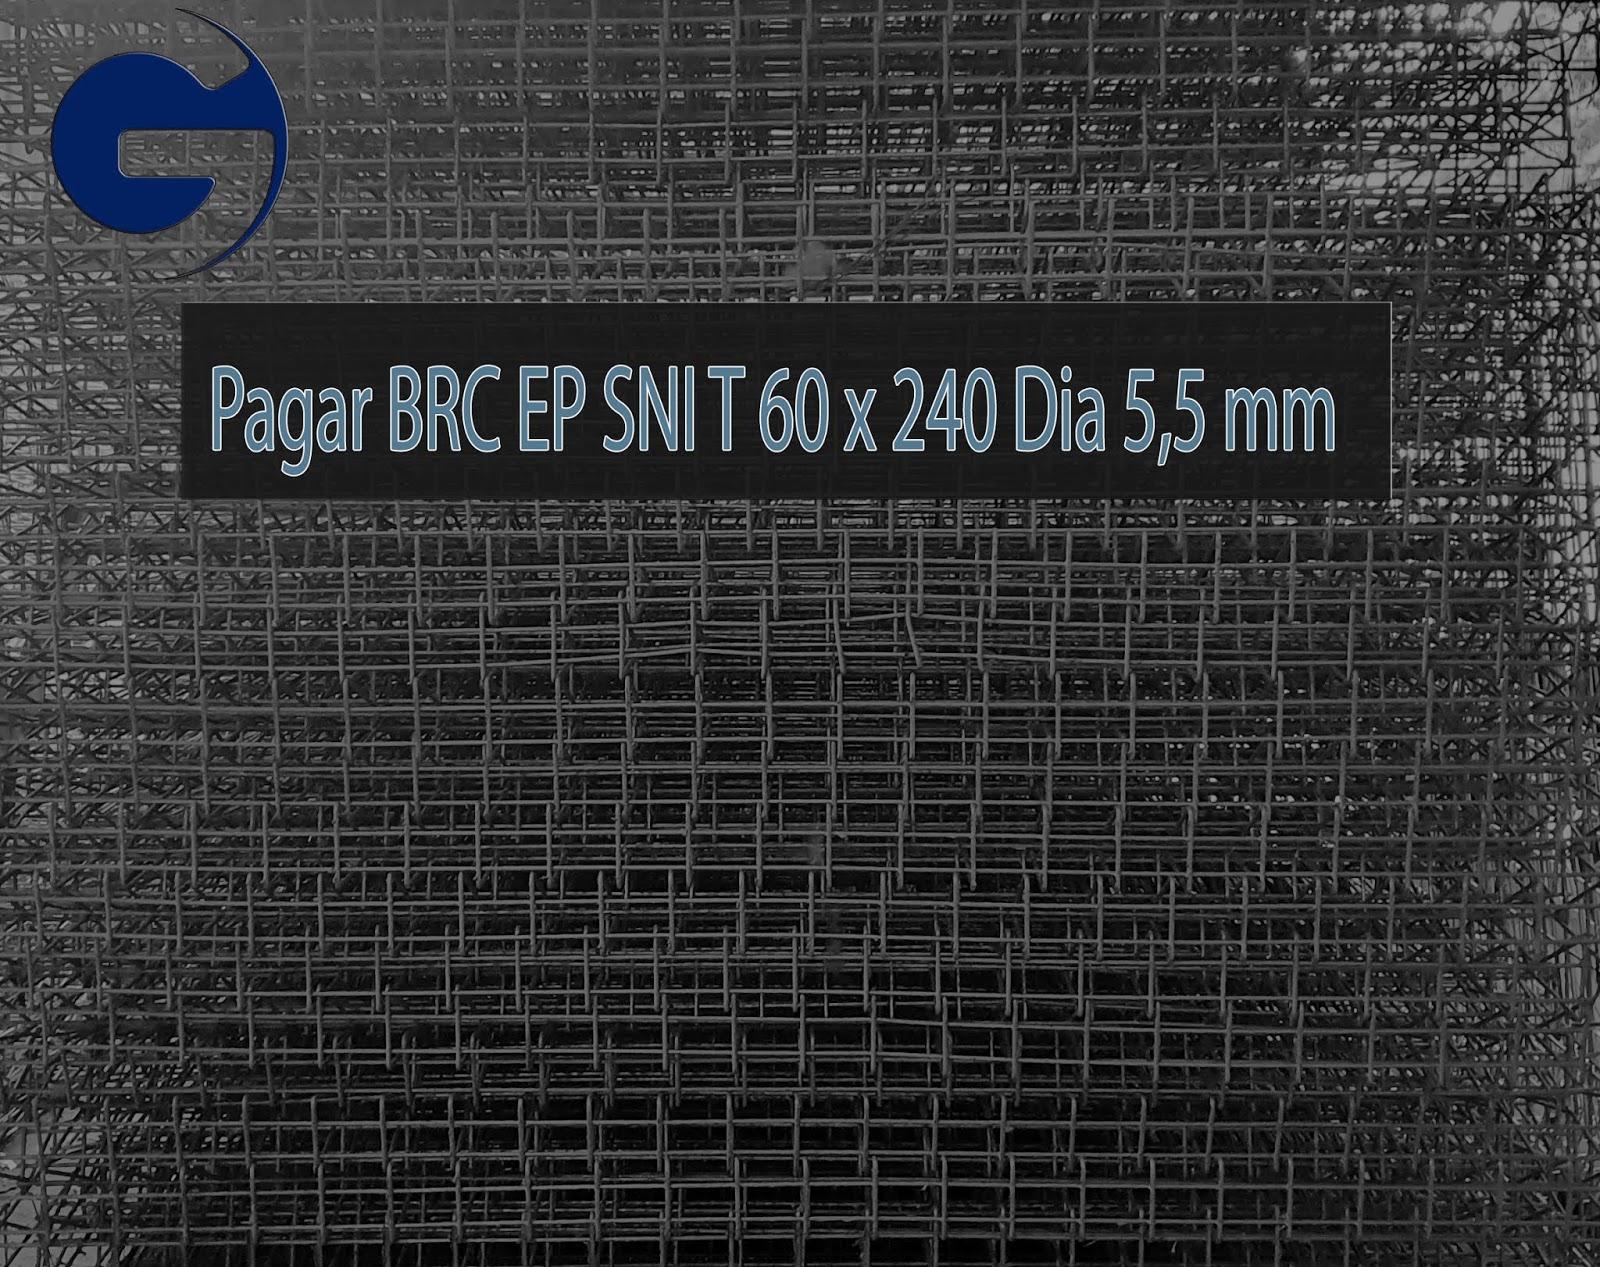 Jual Pagar BRC EP SNI T 60 x 240 Dia 5,5 mm